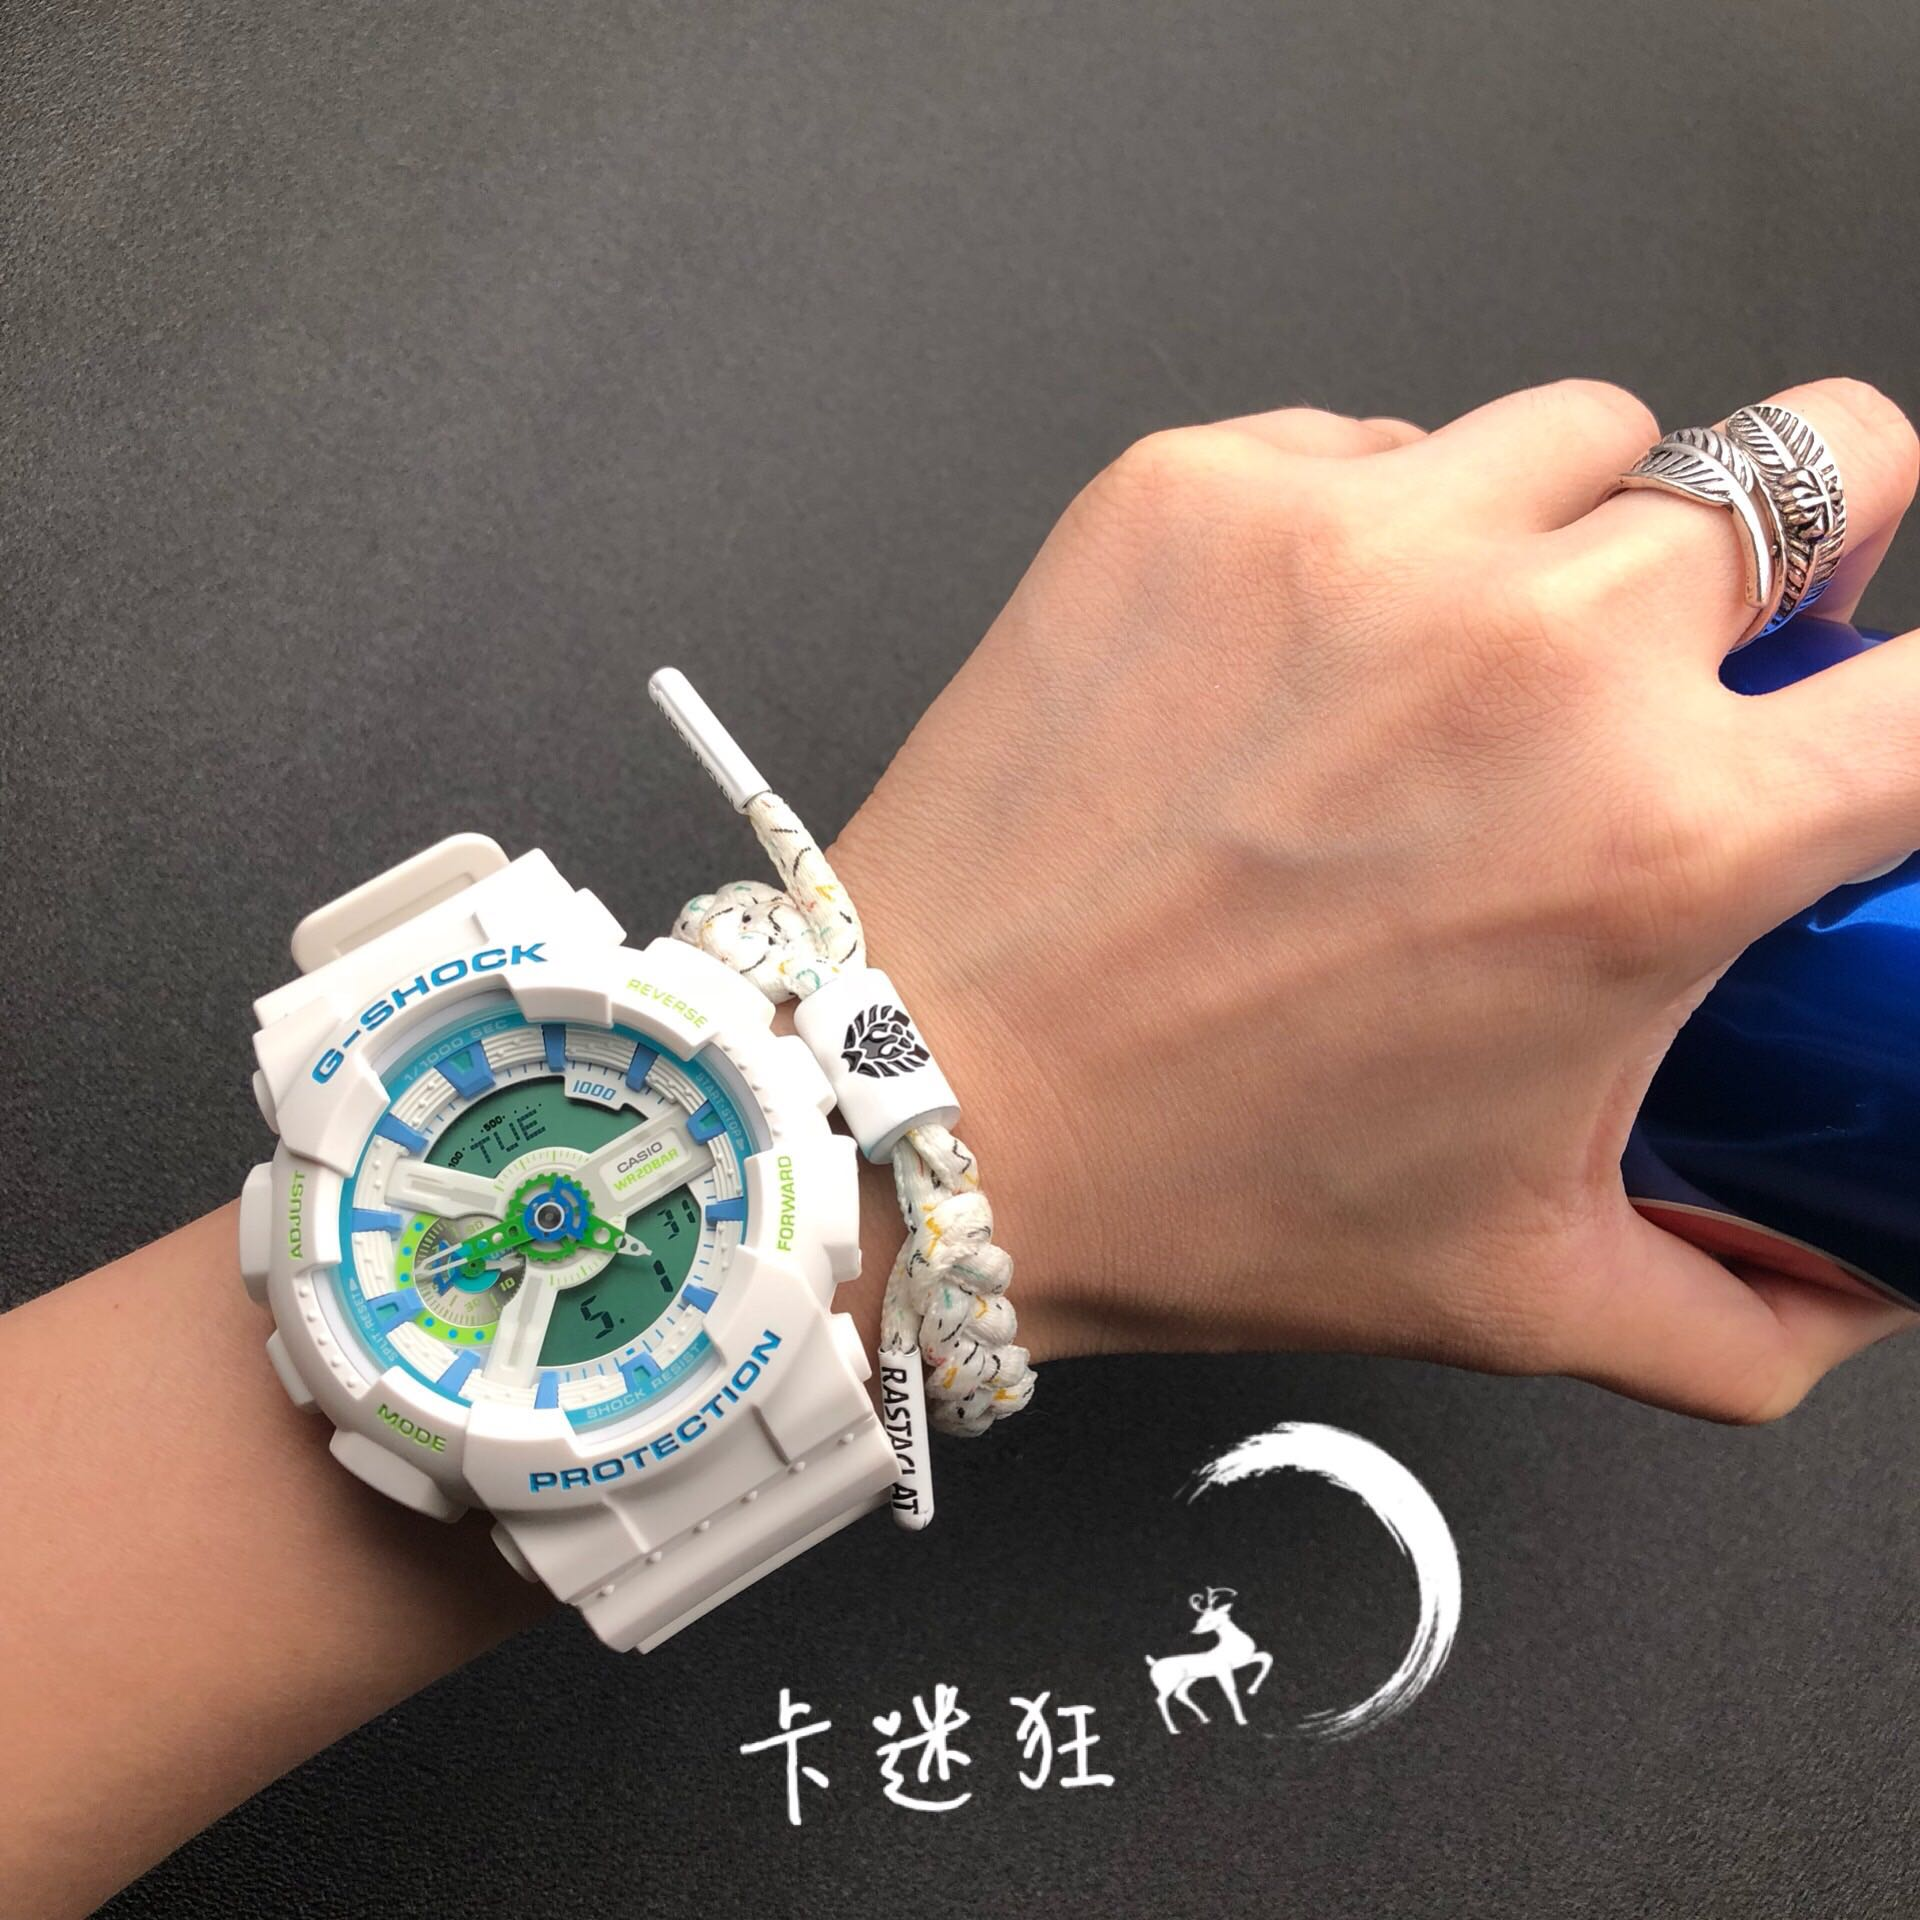 Casio Watch Male Gshock Waterproof Ga 110 Series Gb 1a Rg Cr Fc Mb G Shock 110fc 1adr